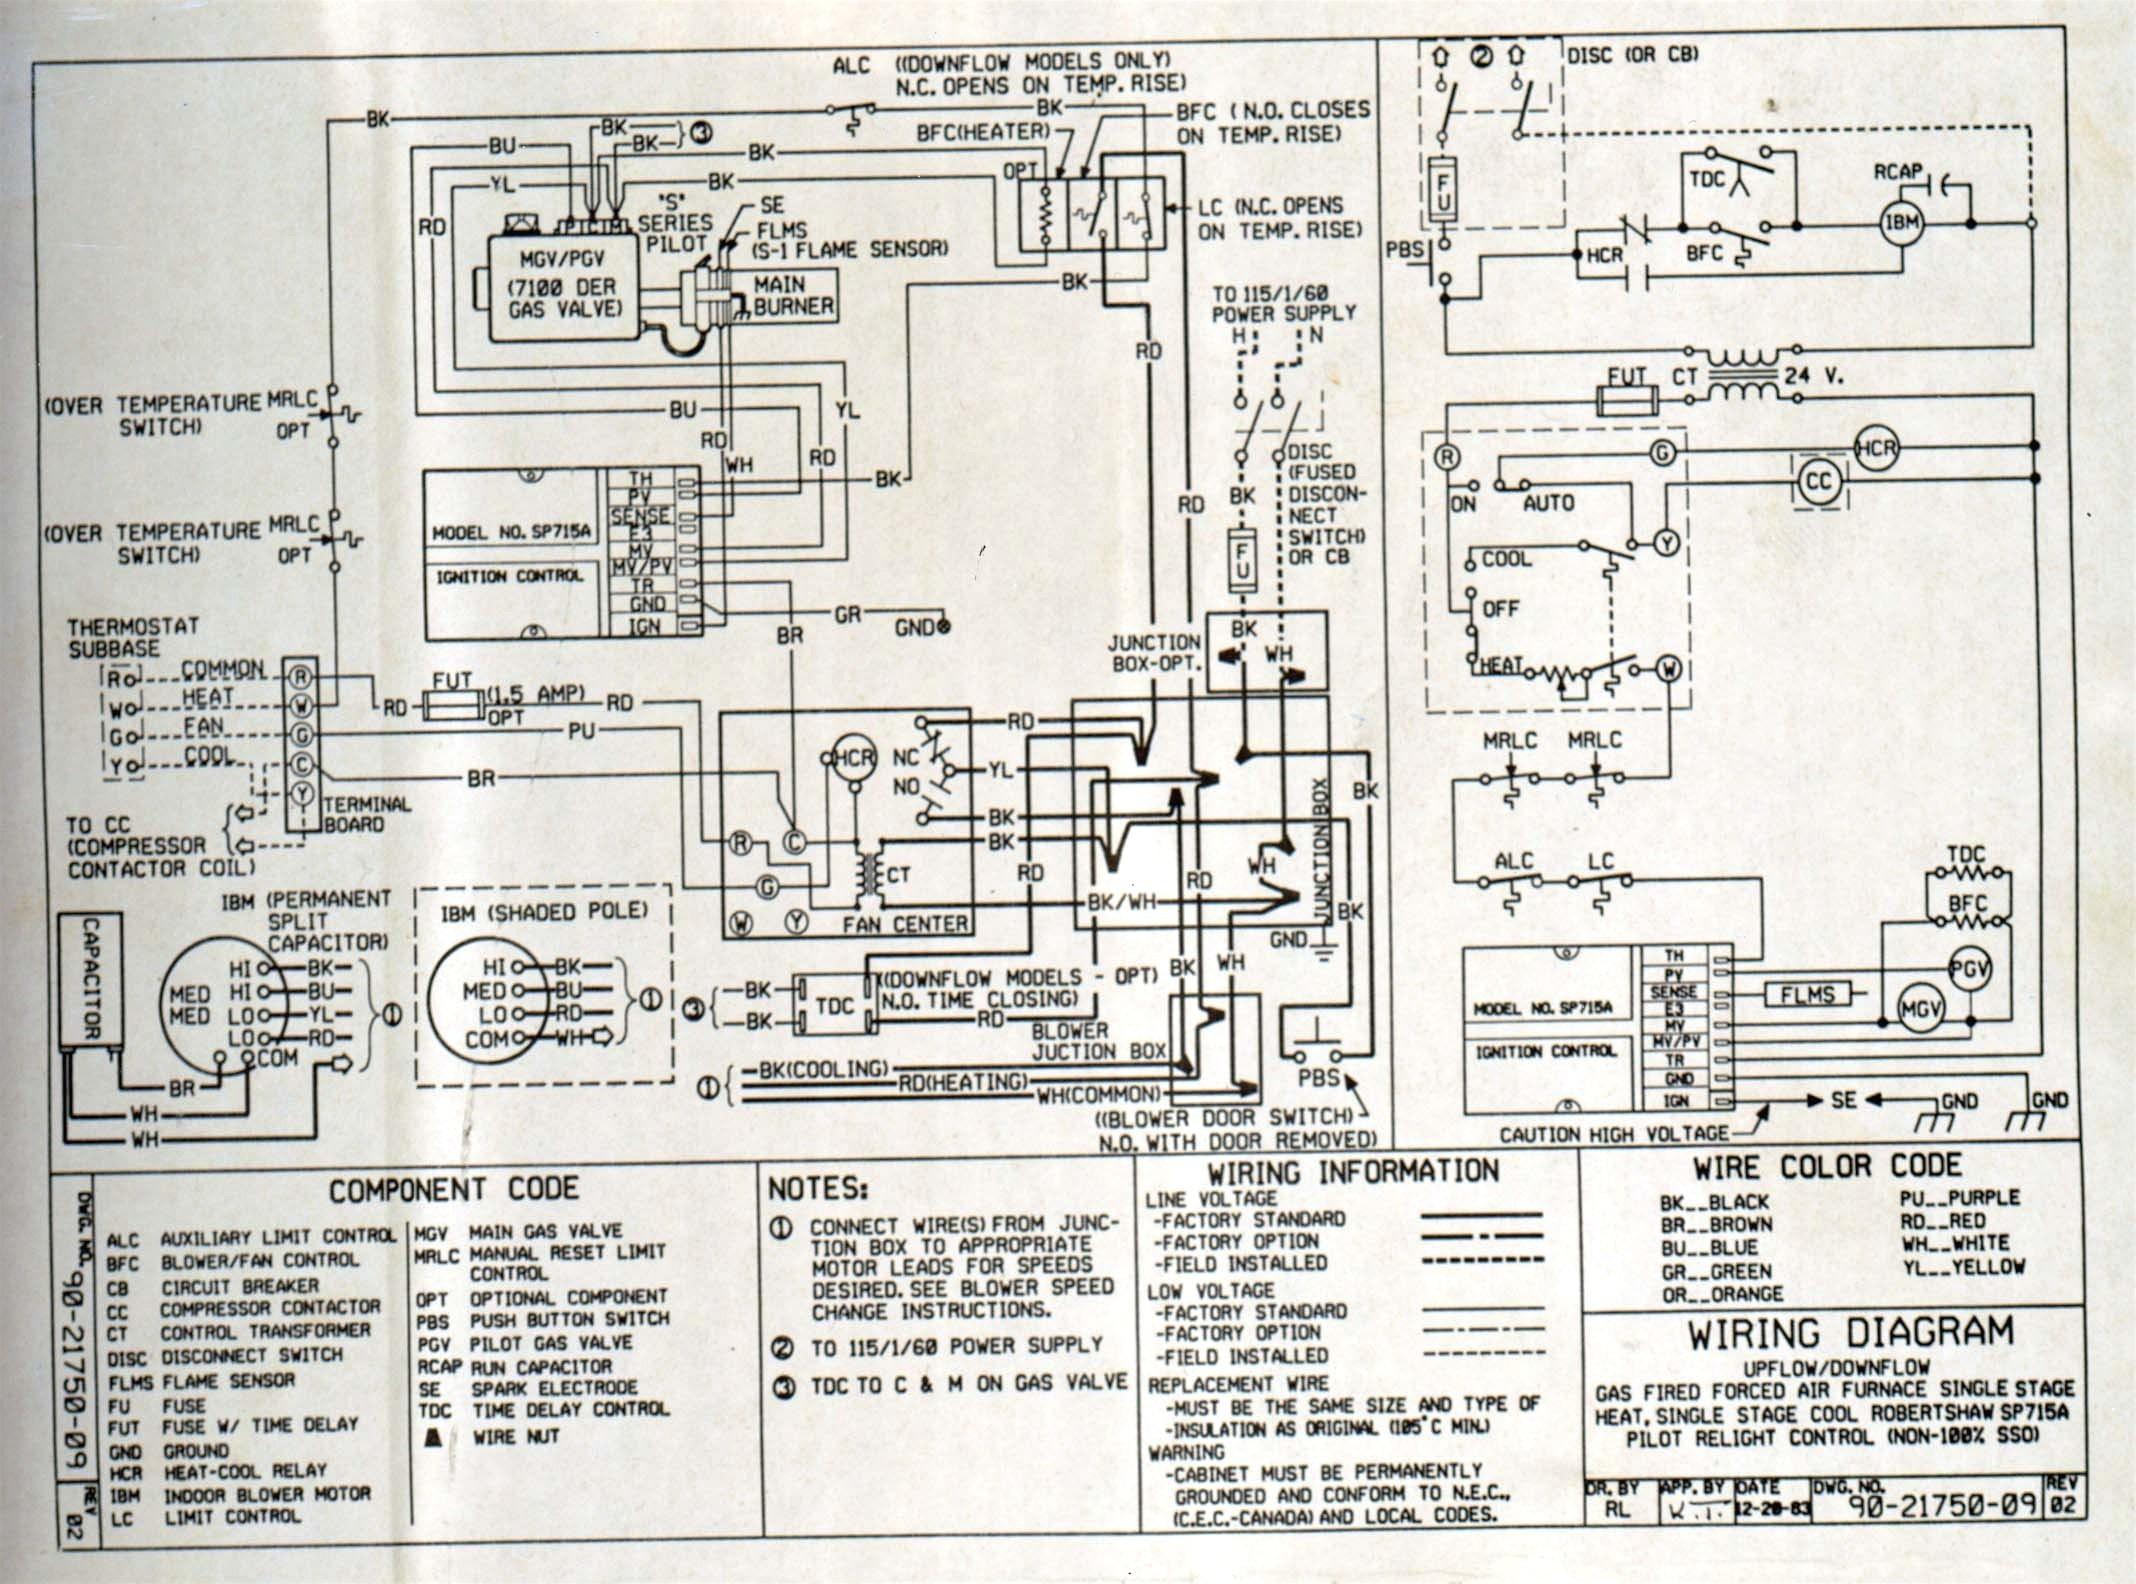 Electric Heat Strip Wiring Diagram Best Goodman Pump Troubleshooting Manual Free Diagrams